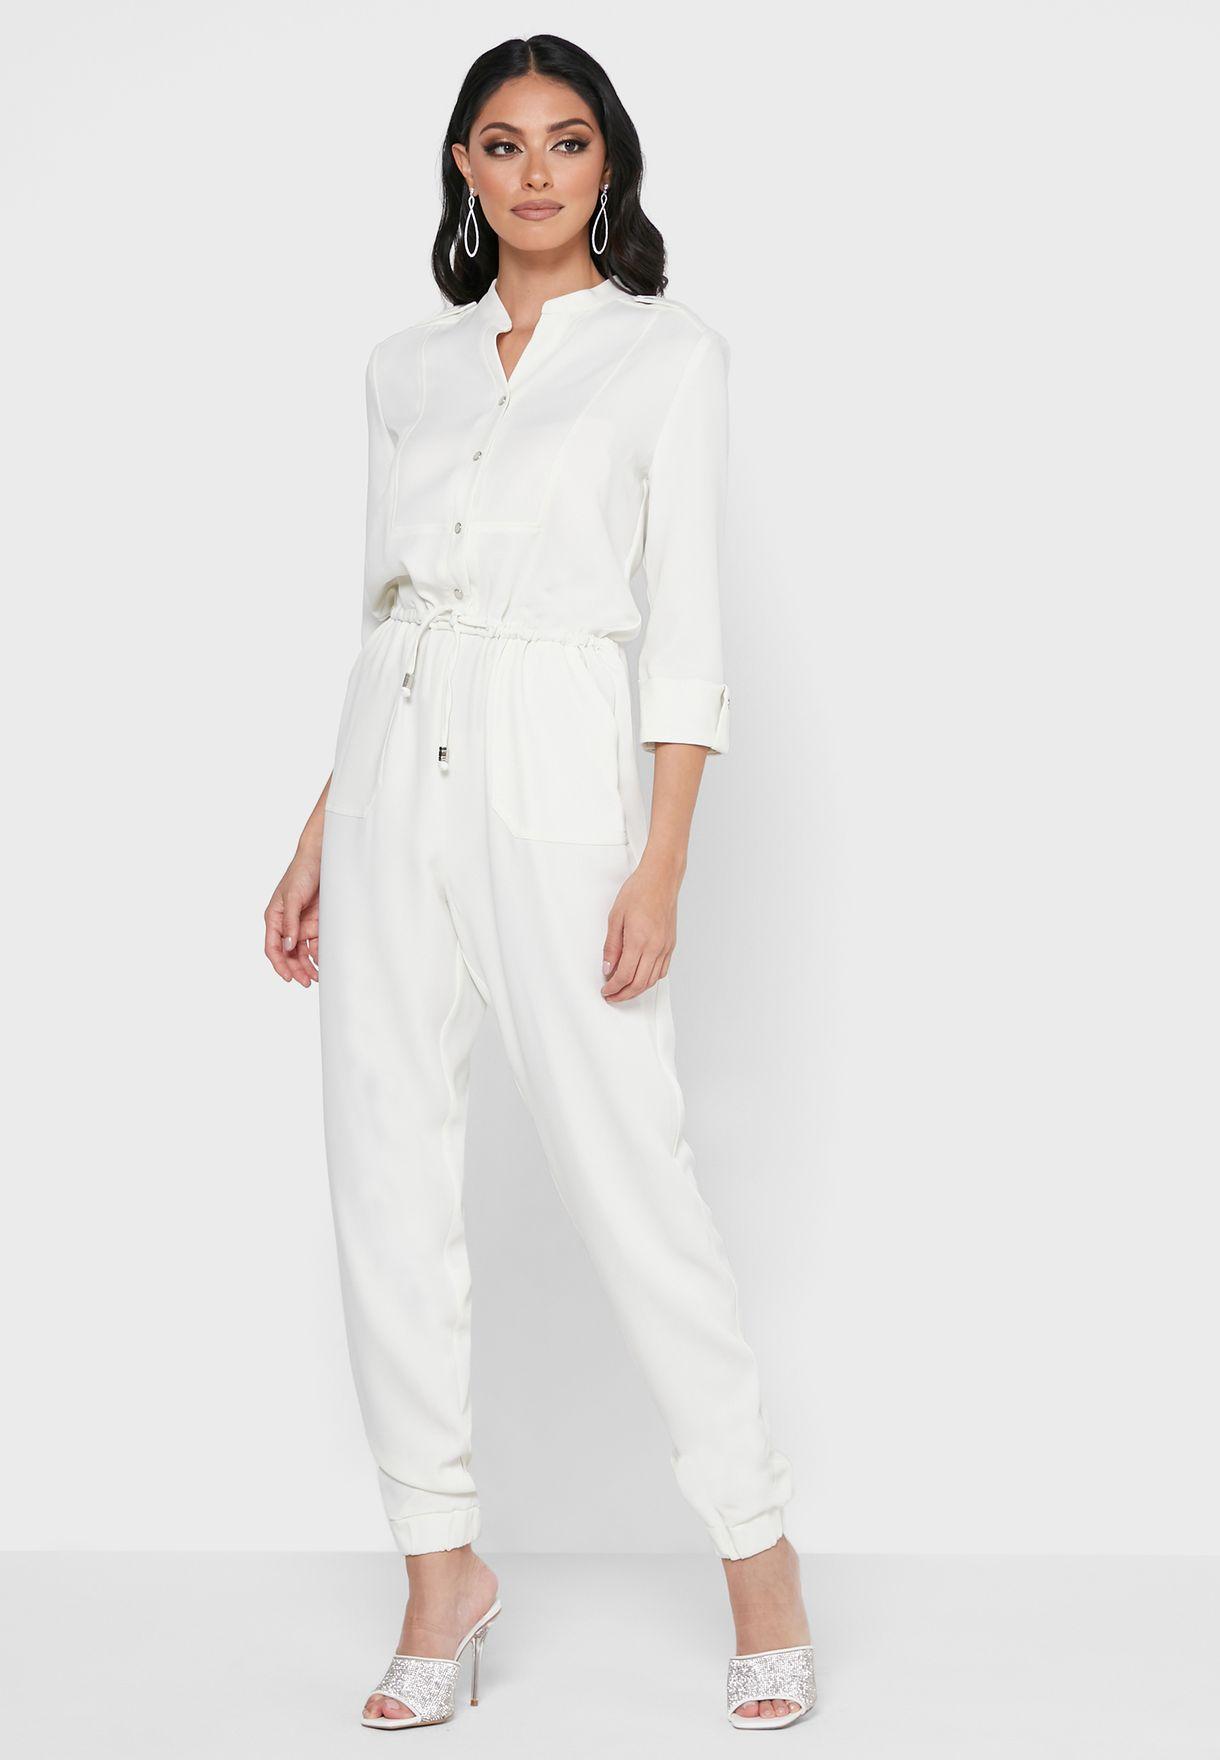 Quarter sleeves jumpsuit